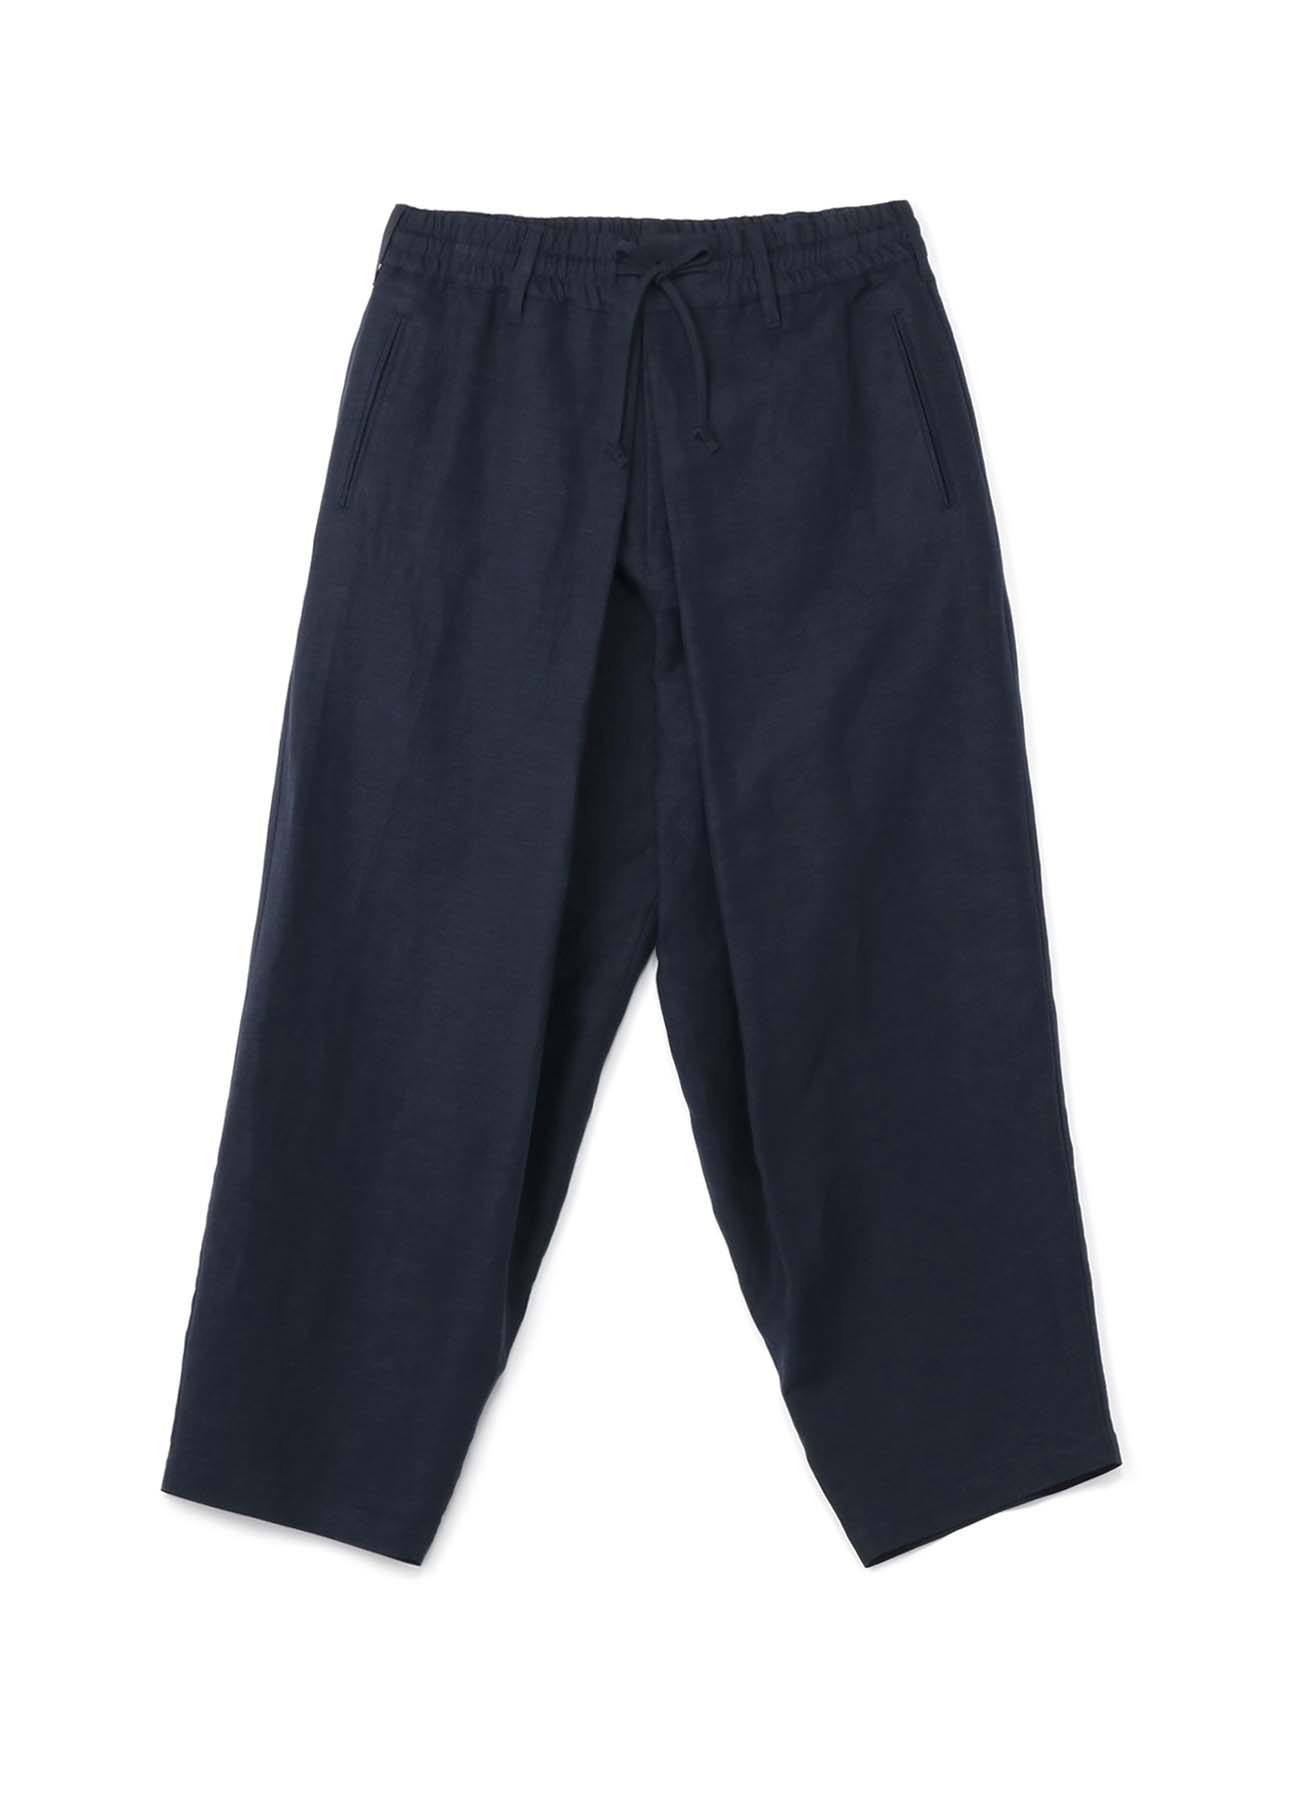 Rayon Linen Easy Cross・B Center Wide Tack Pants